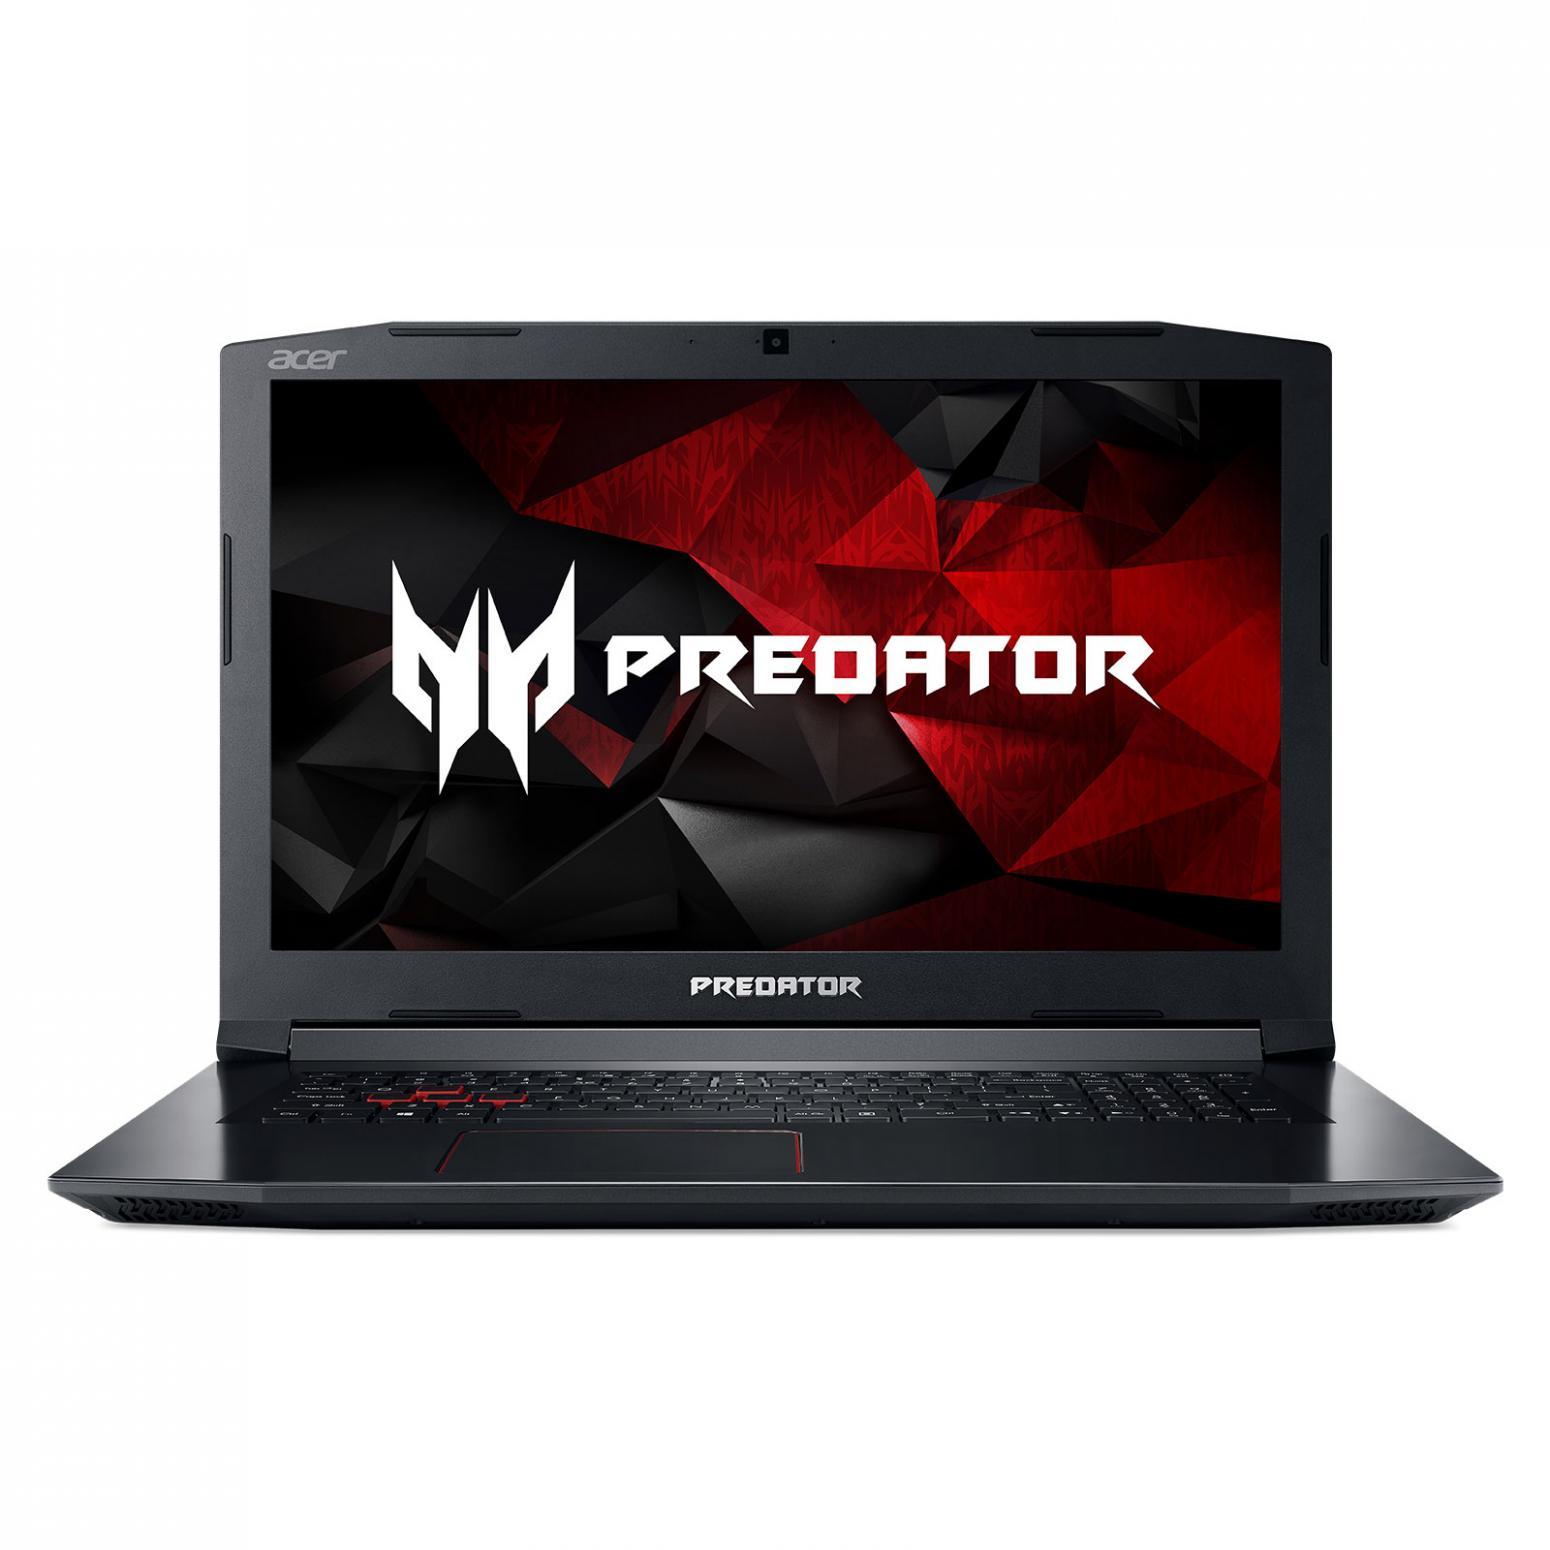 Image du PC portable Acer Predator Helios 300 PH317-52-77LX - GTX 1060